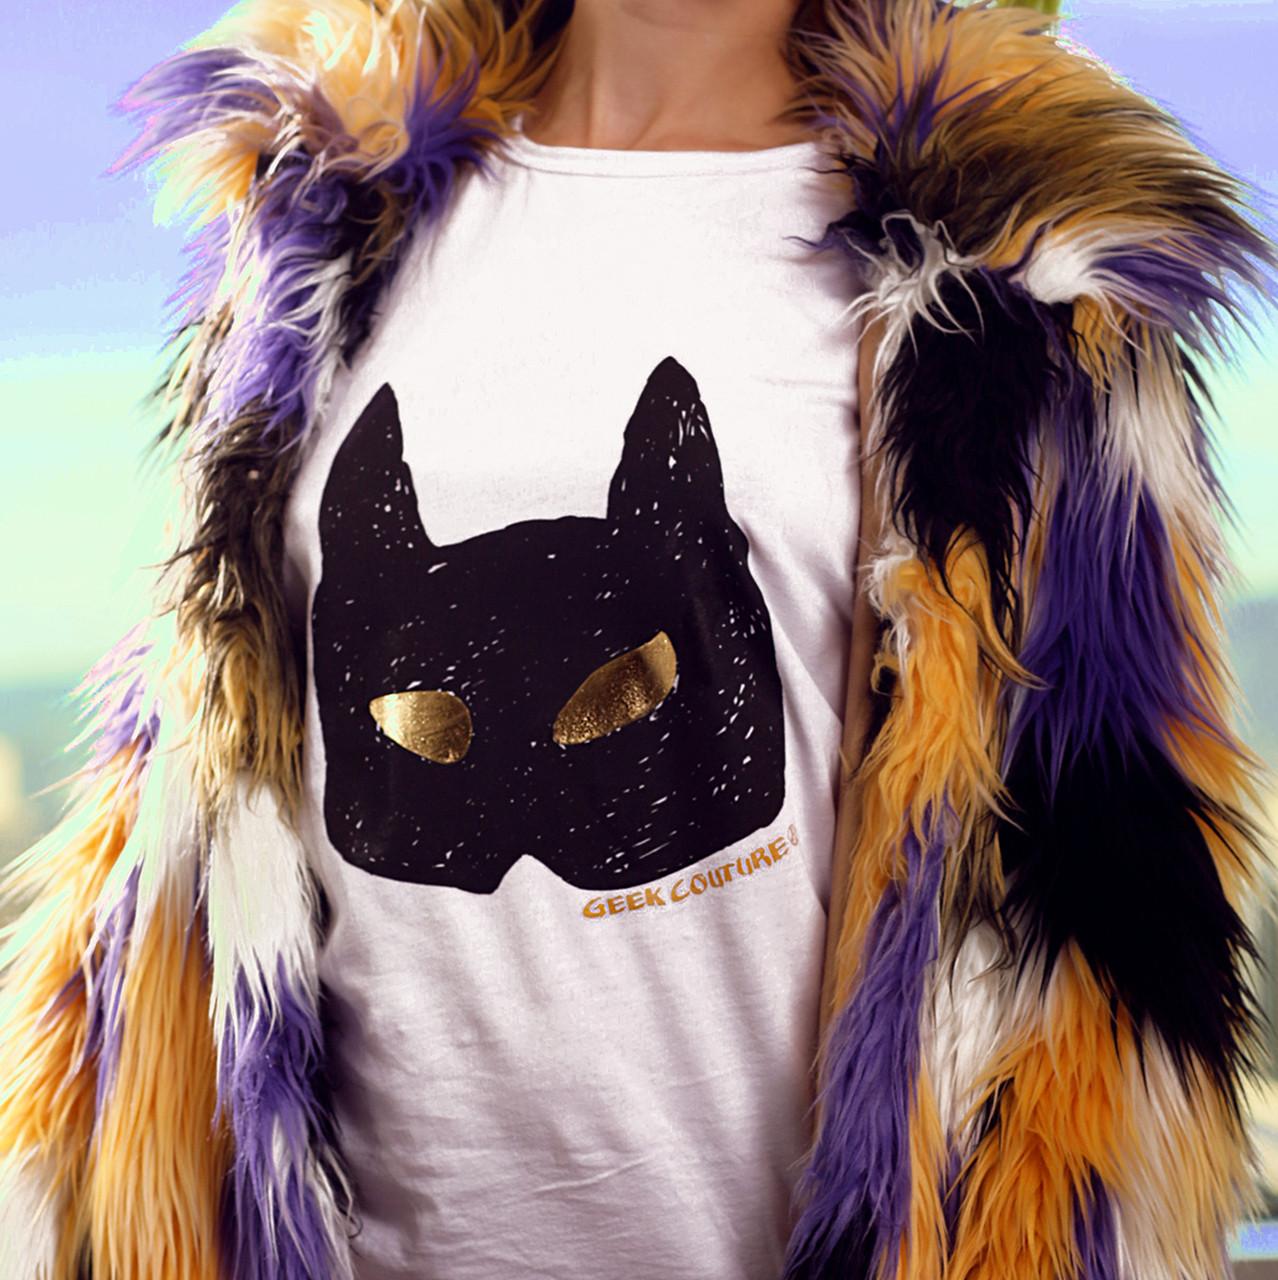 Glow-In-The-Dark Gold Eyes Handmade T-Shirt